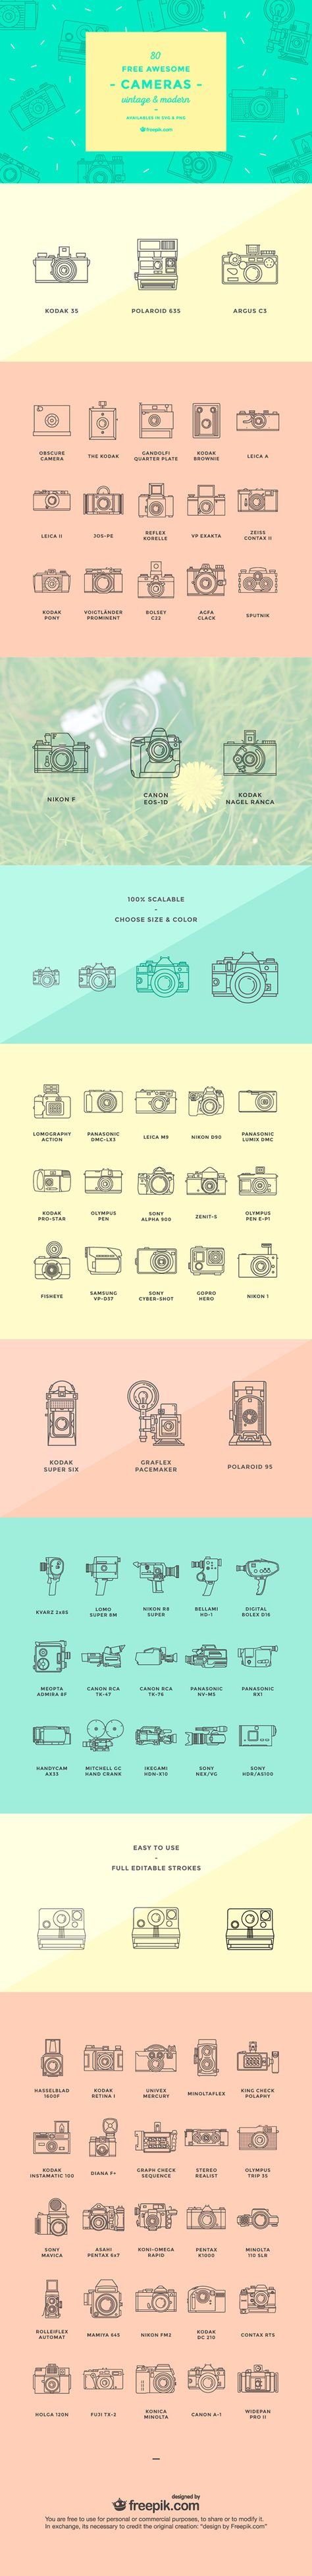 Stock Vector  - Vintage Cameras - http://www.design-share.com/2015/08/stock-vector-vintage-cameras.html